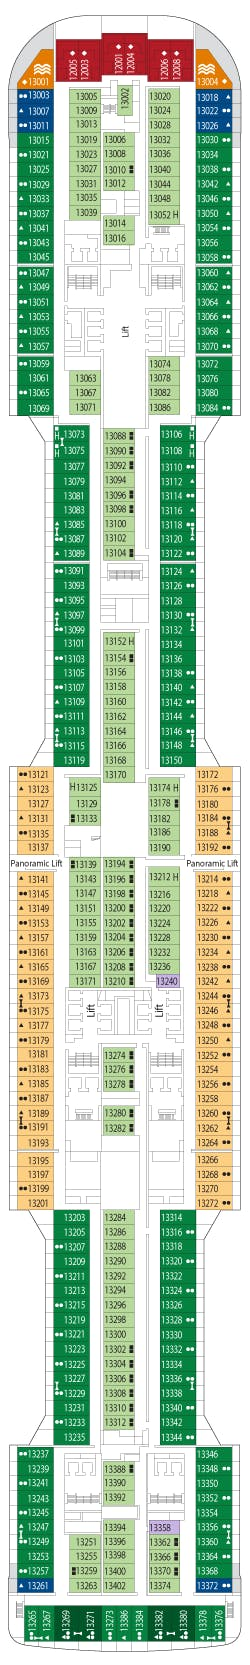 MSC Grandiosa deck plans - Cruiseline.com